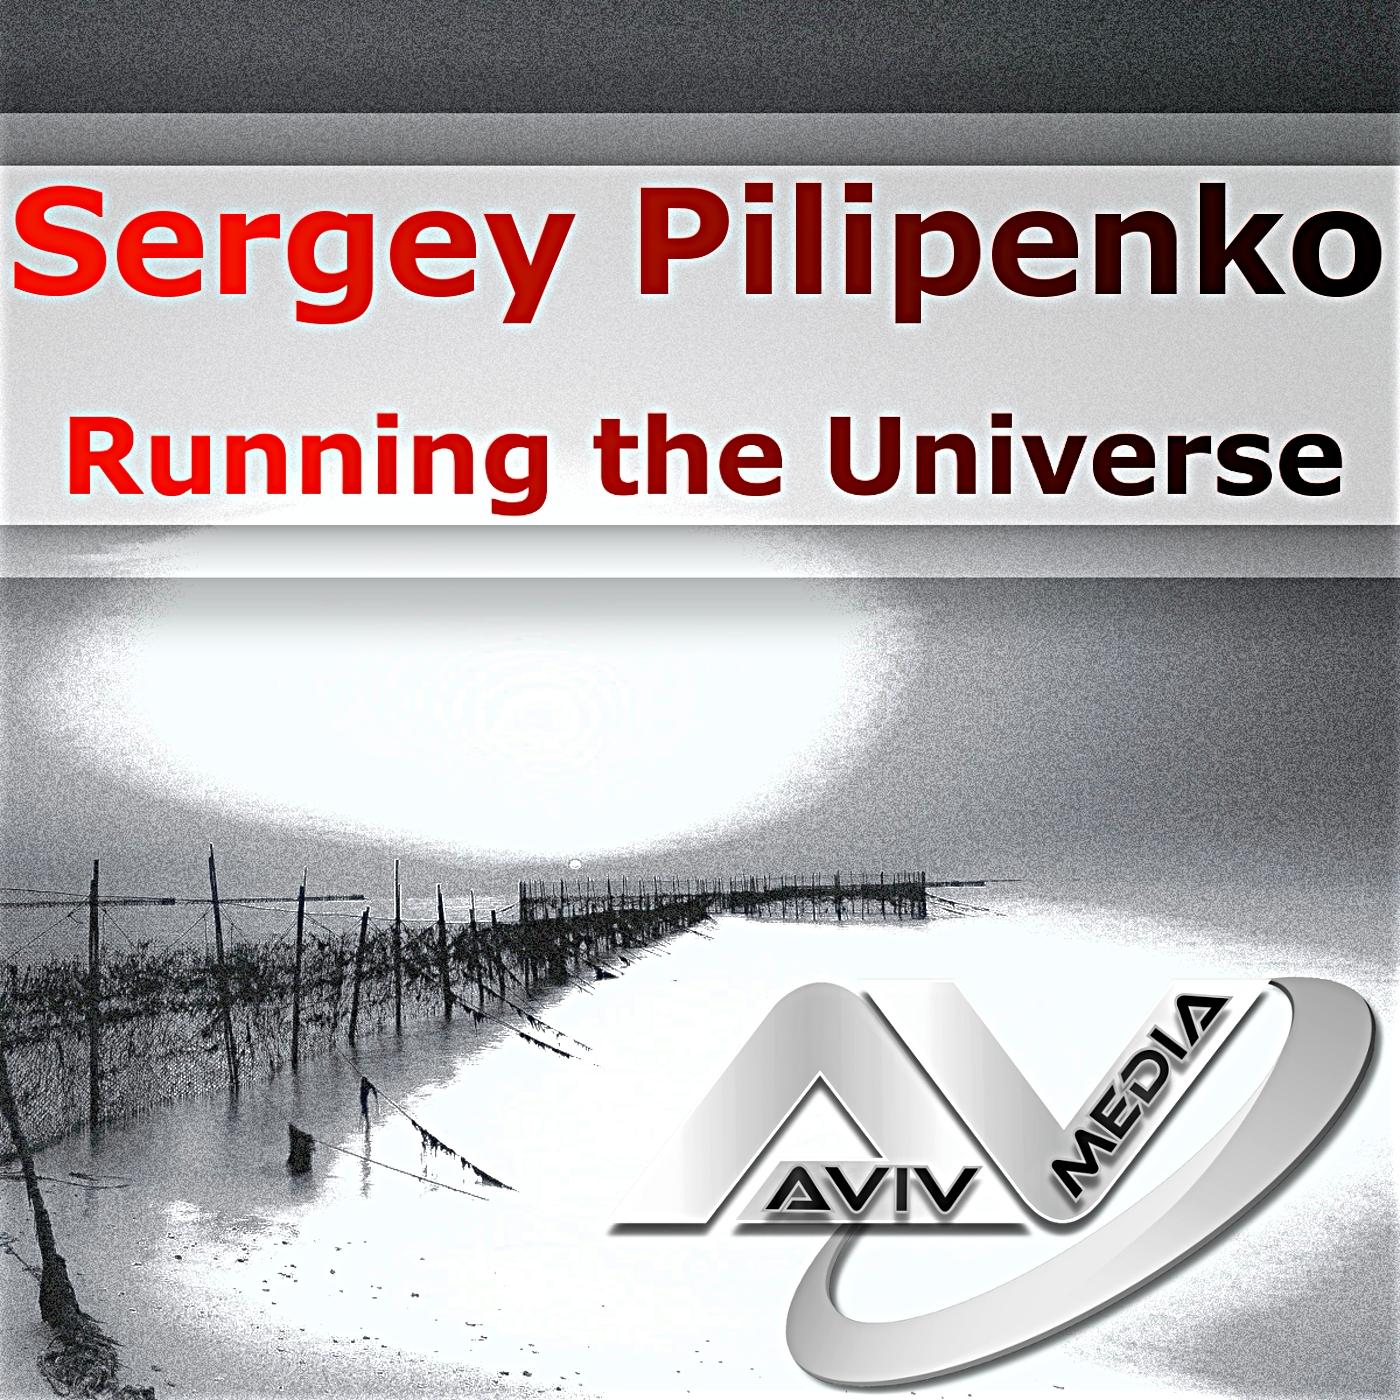 Sergey Pilipenko - Running the Universe (Original Mix)